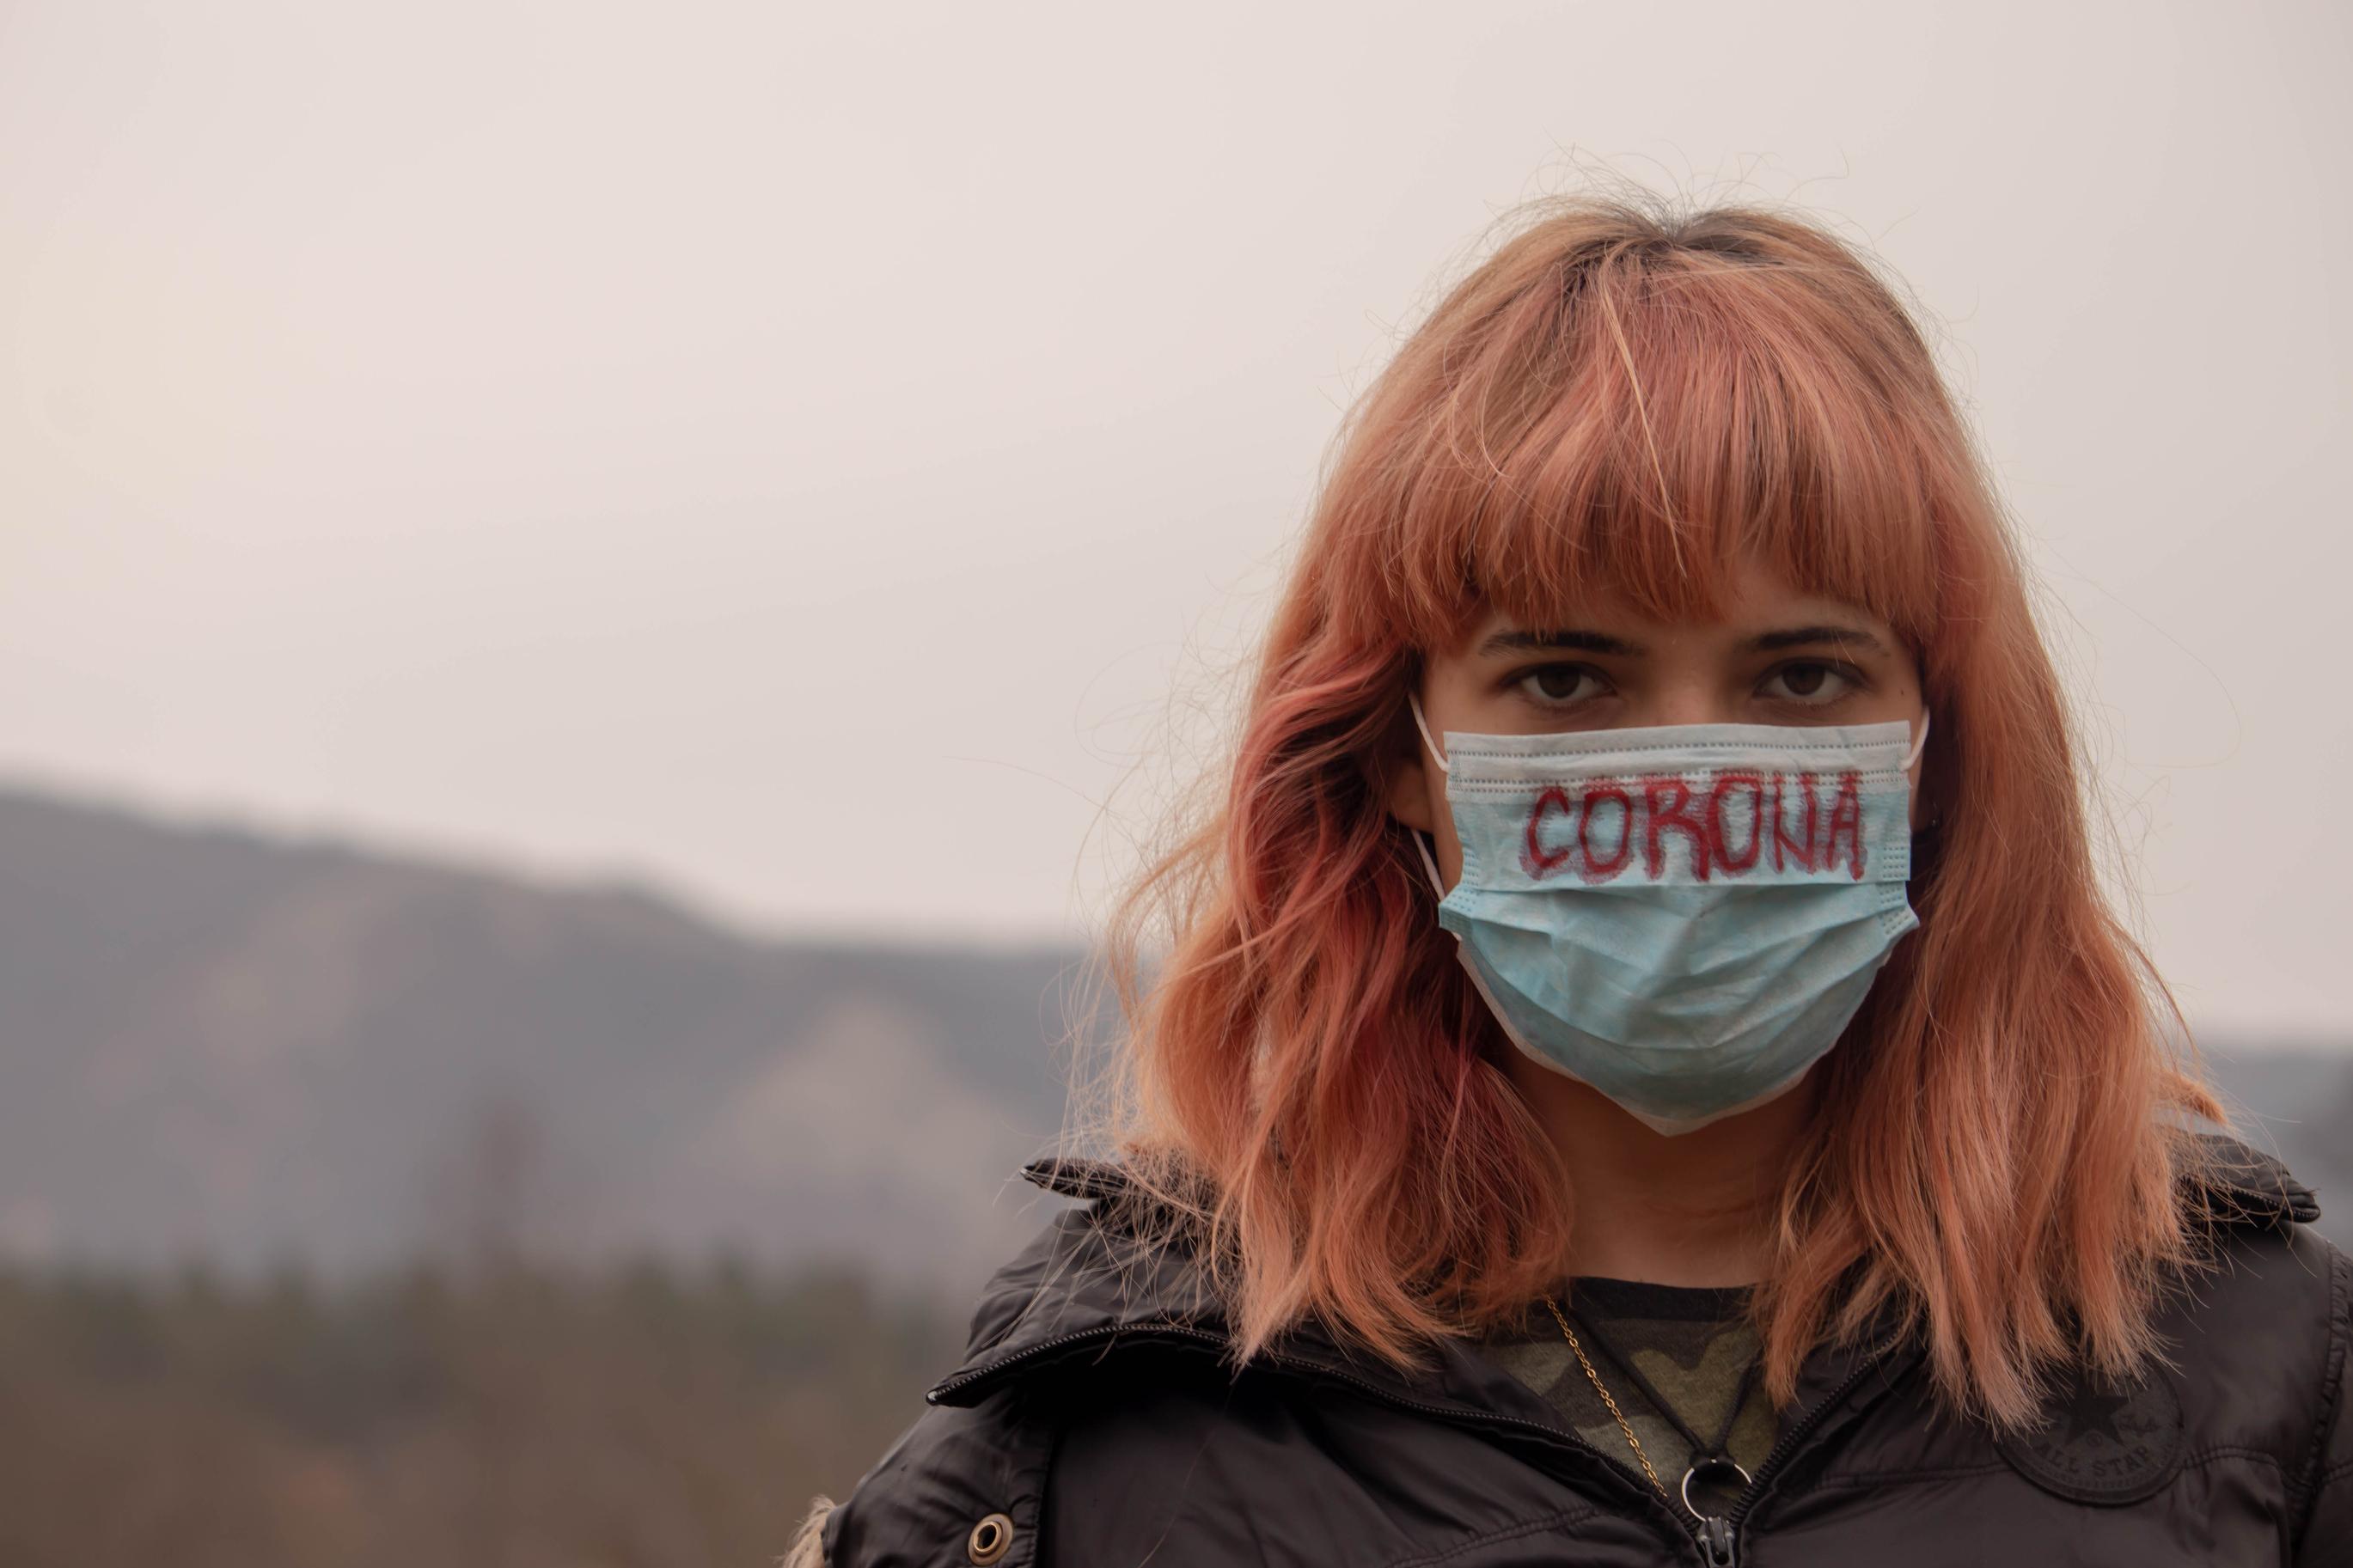 COVID-19 mask girl